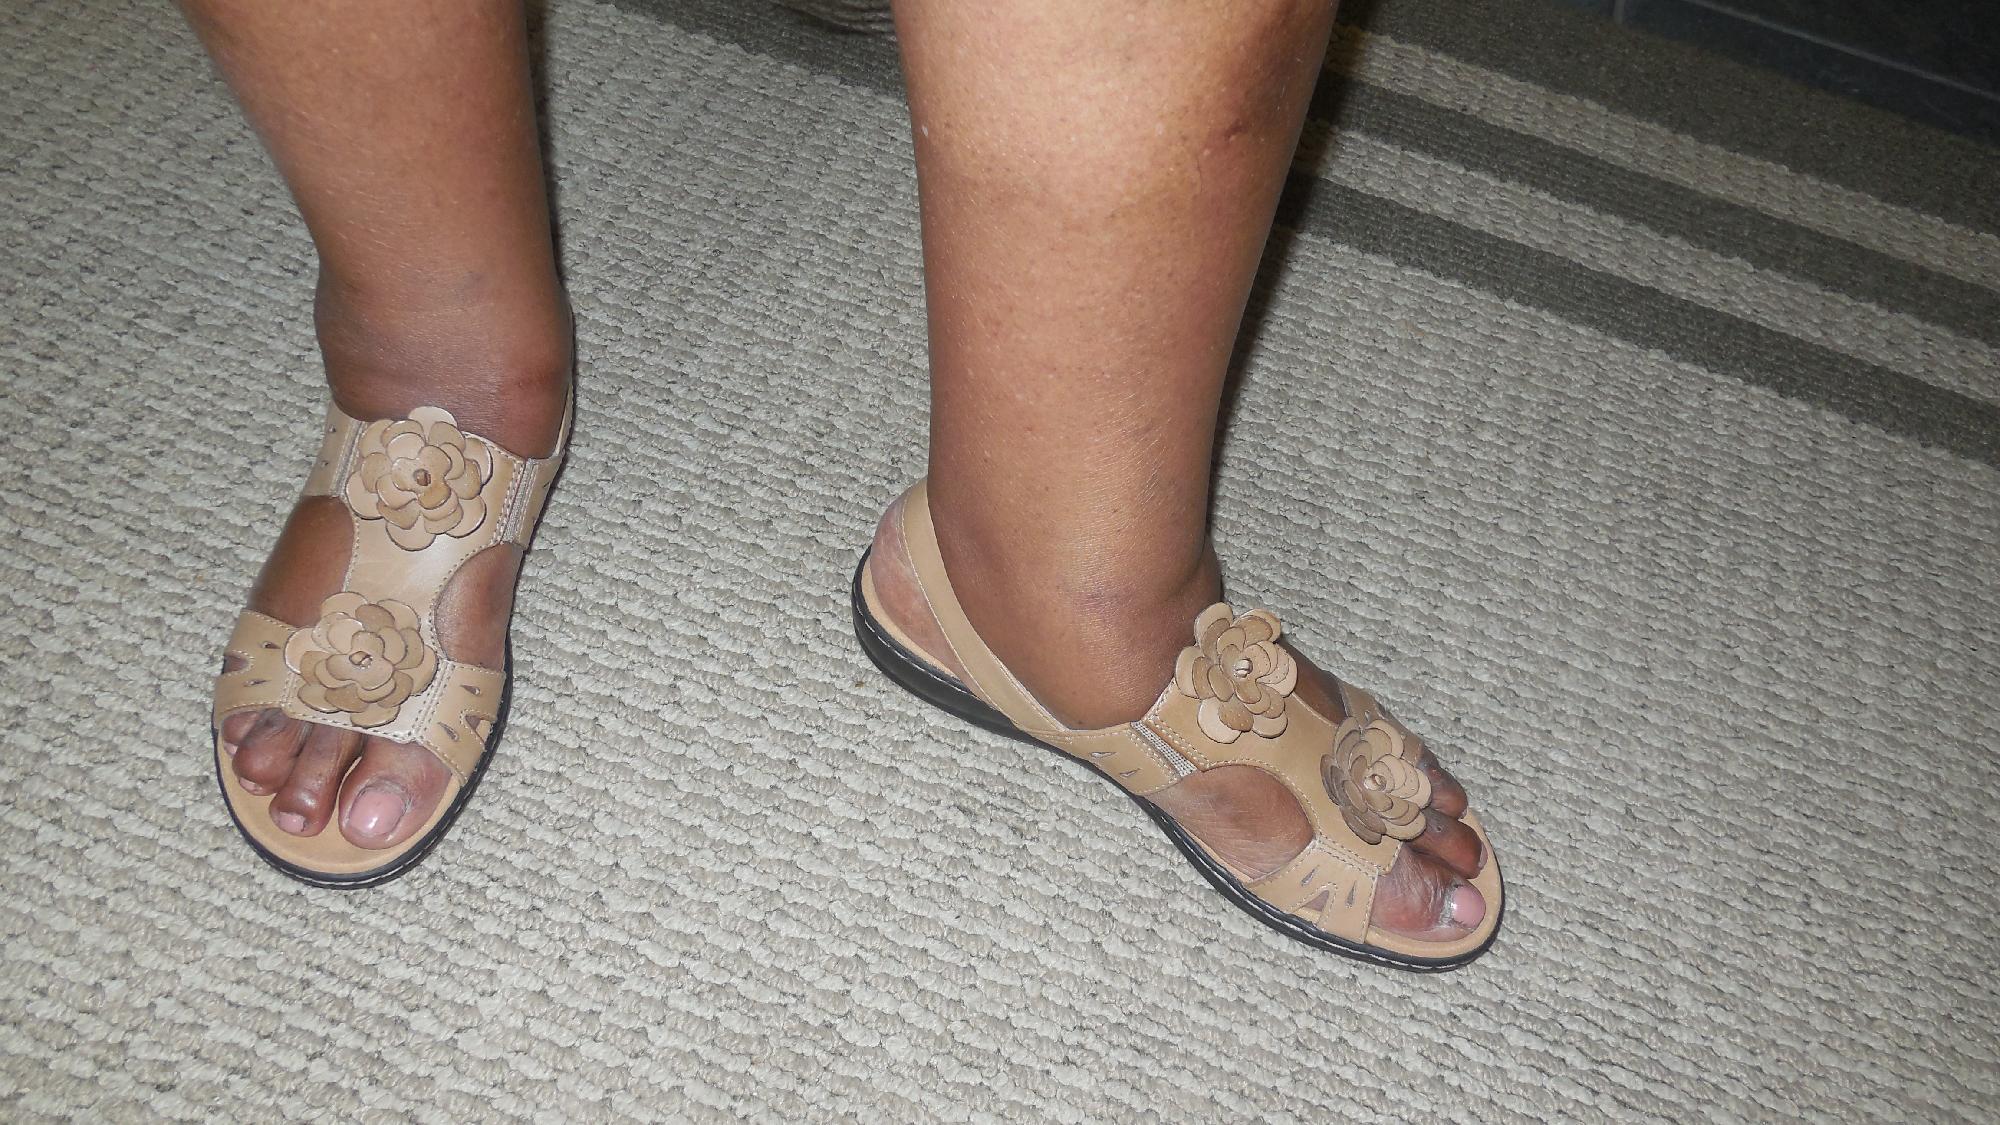 4feea3316e2 Clarks leisa claytin reviews jpg 2000x1125 Clark sandals discontinued